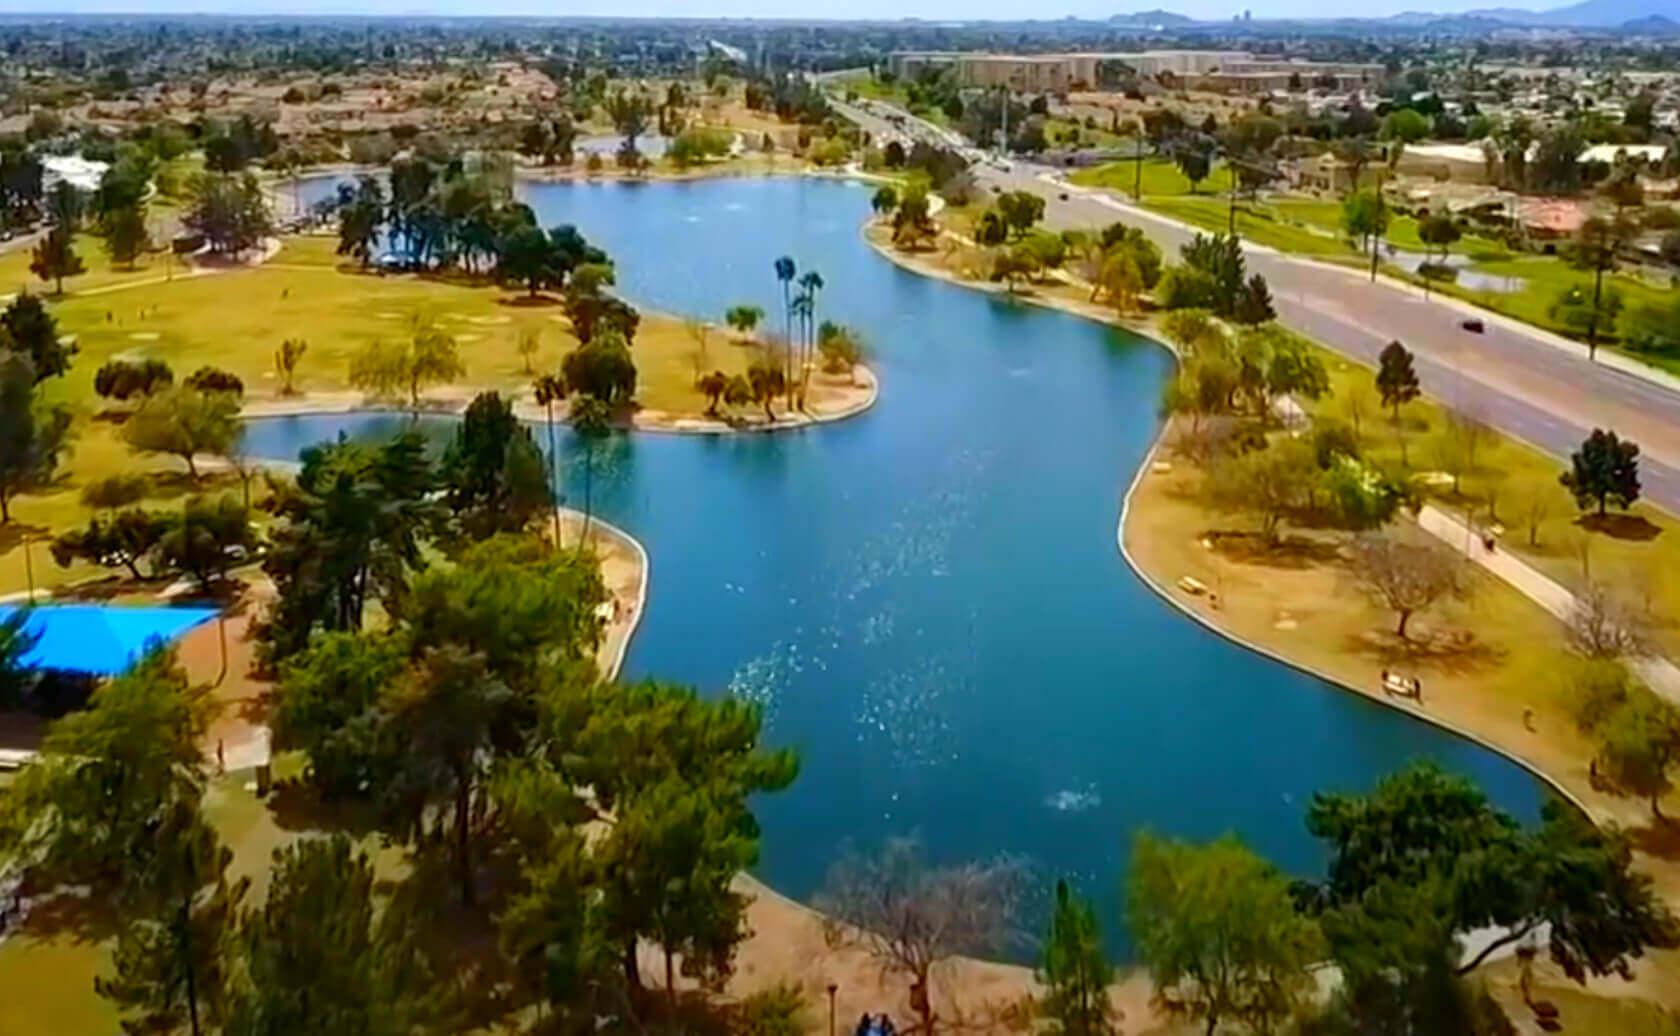 Chaparral-Lake-Fishing-Guide-Scottsdale-AZ-04